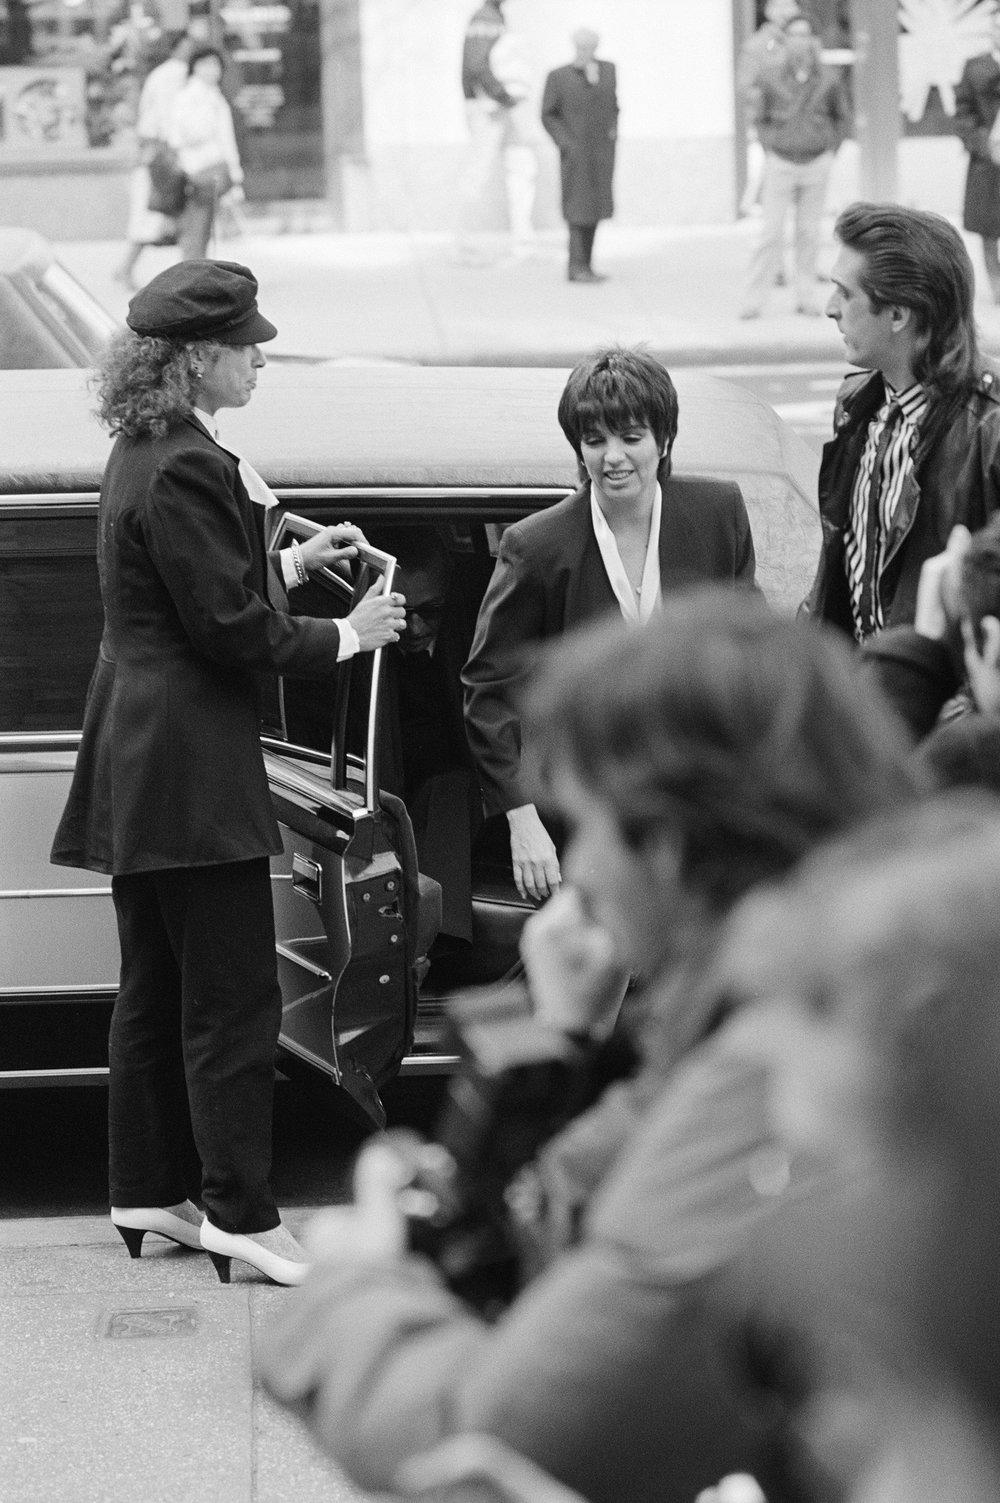 Liza Minnelli Exiting Limo